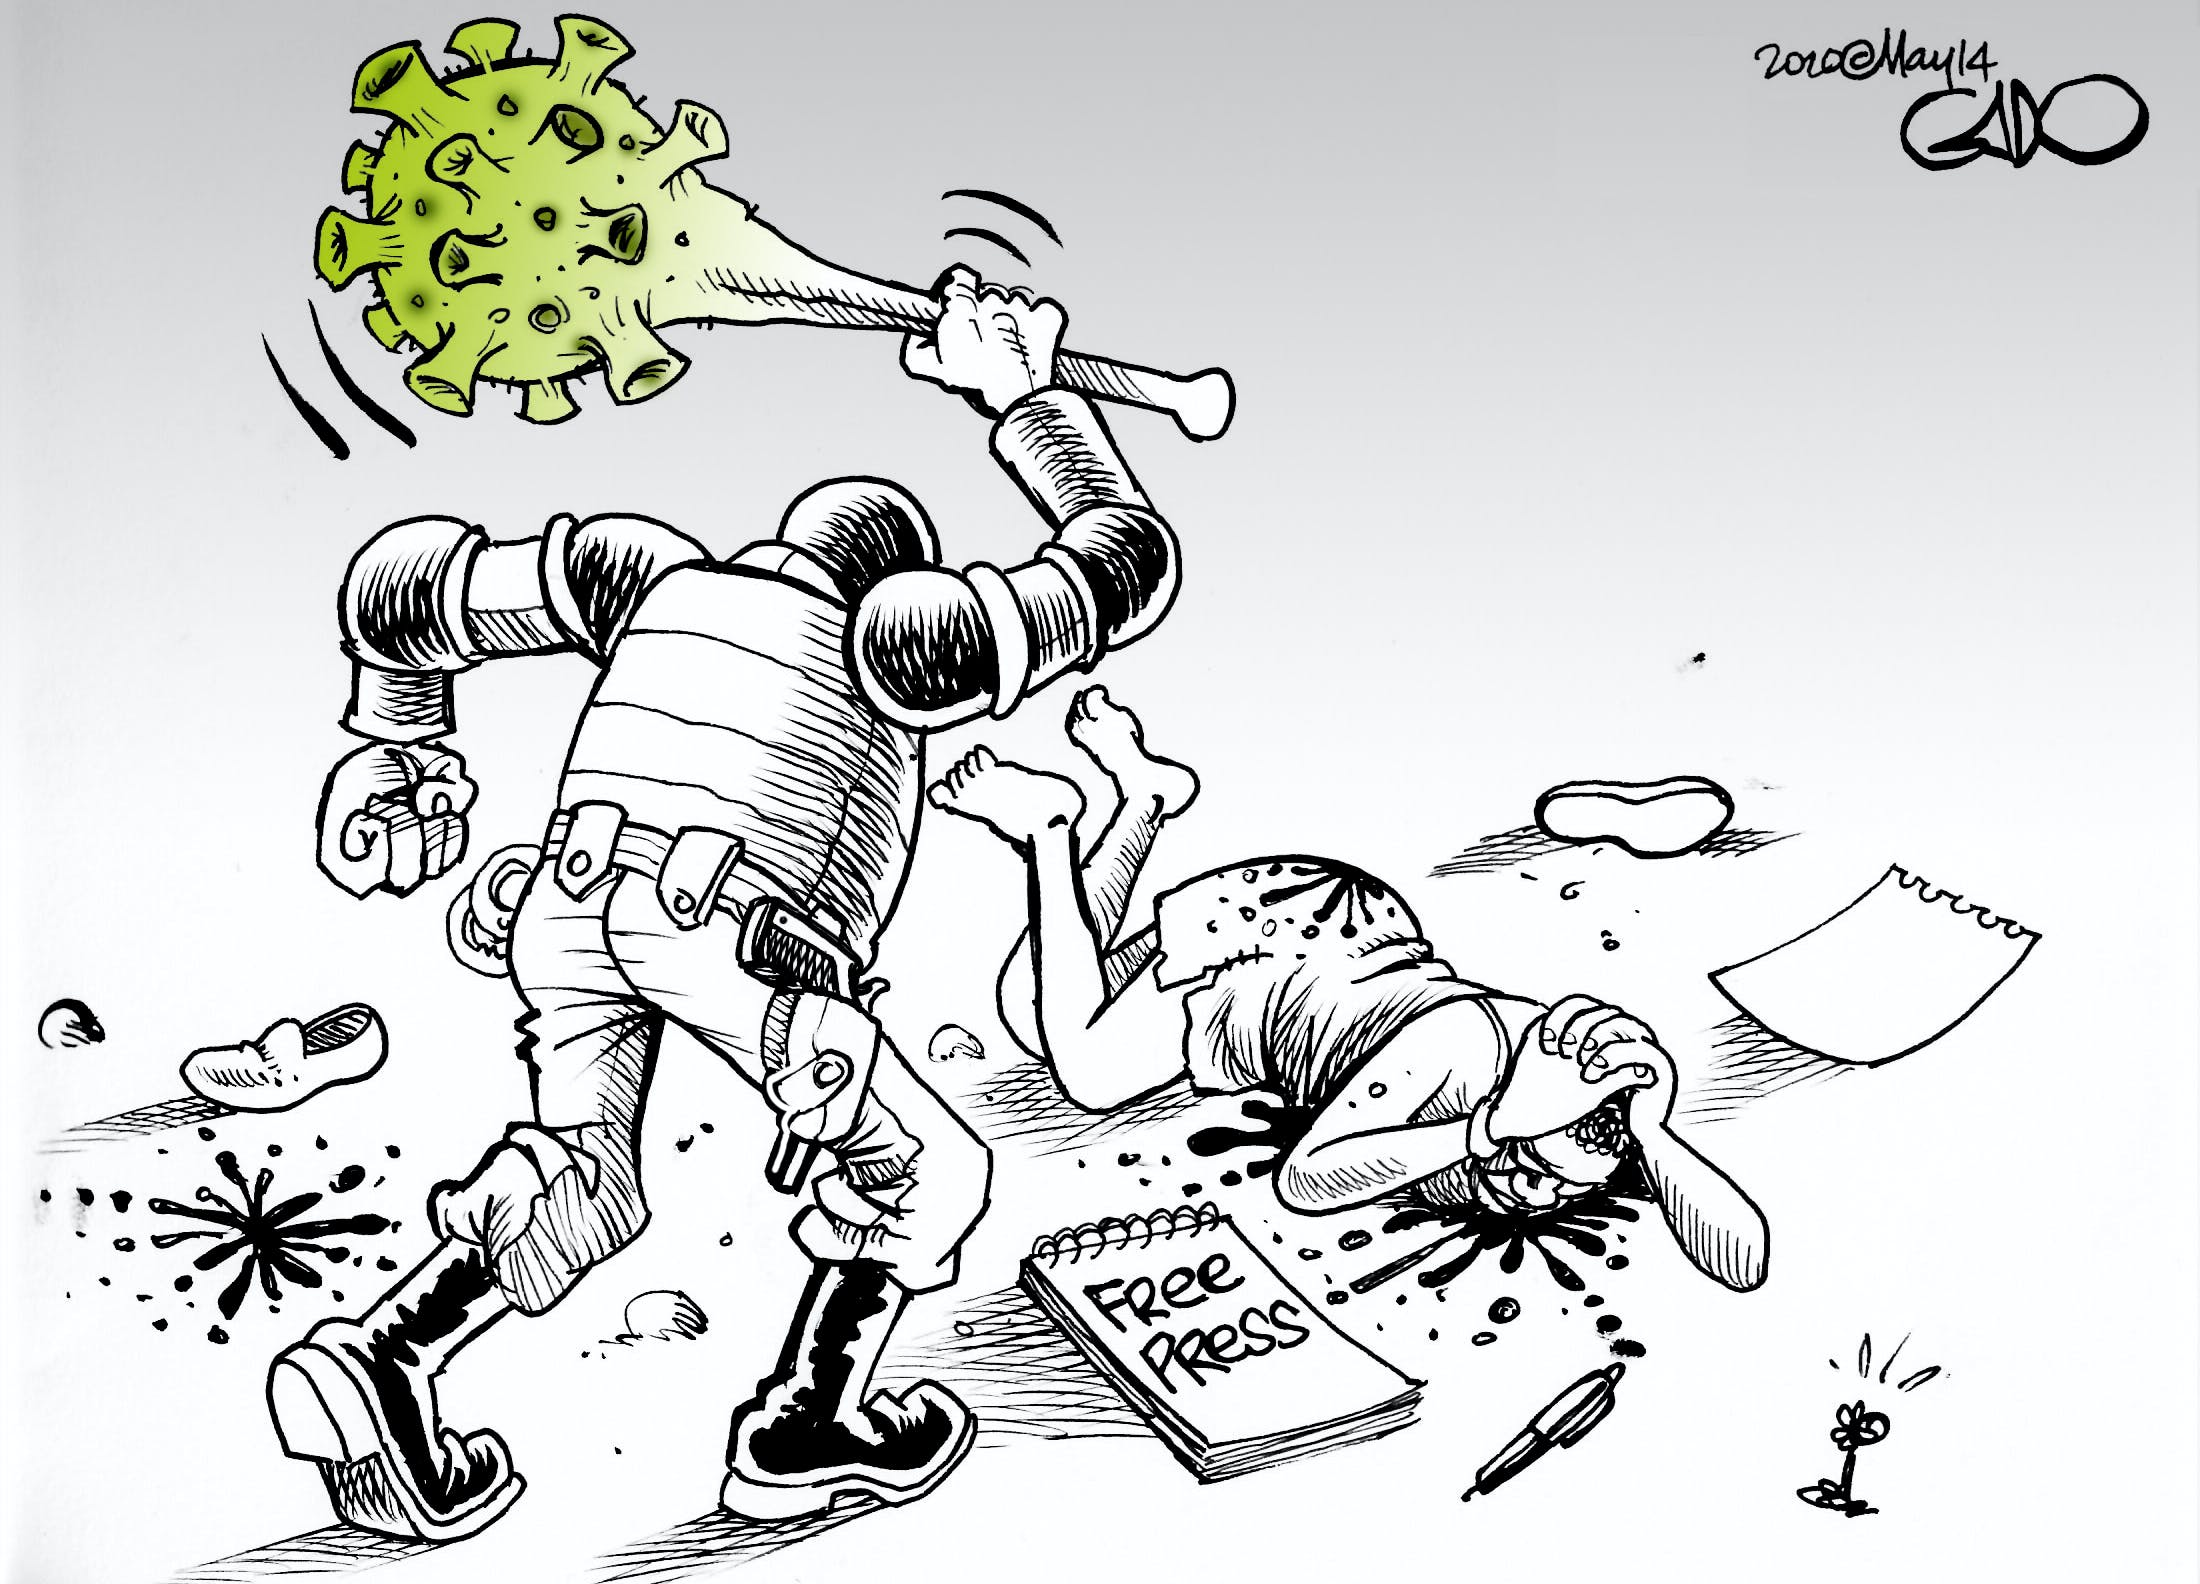 Gado - Kenya - dessin de presse - Cartooning for Peace